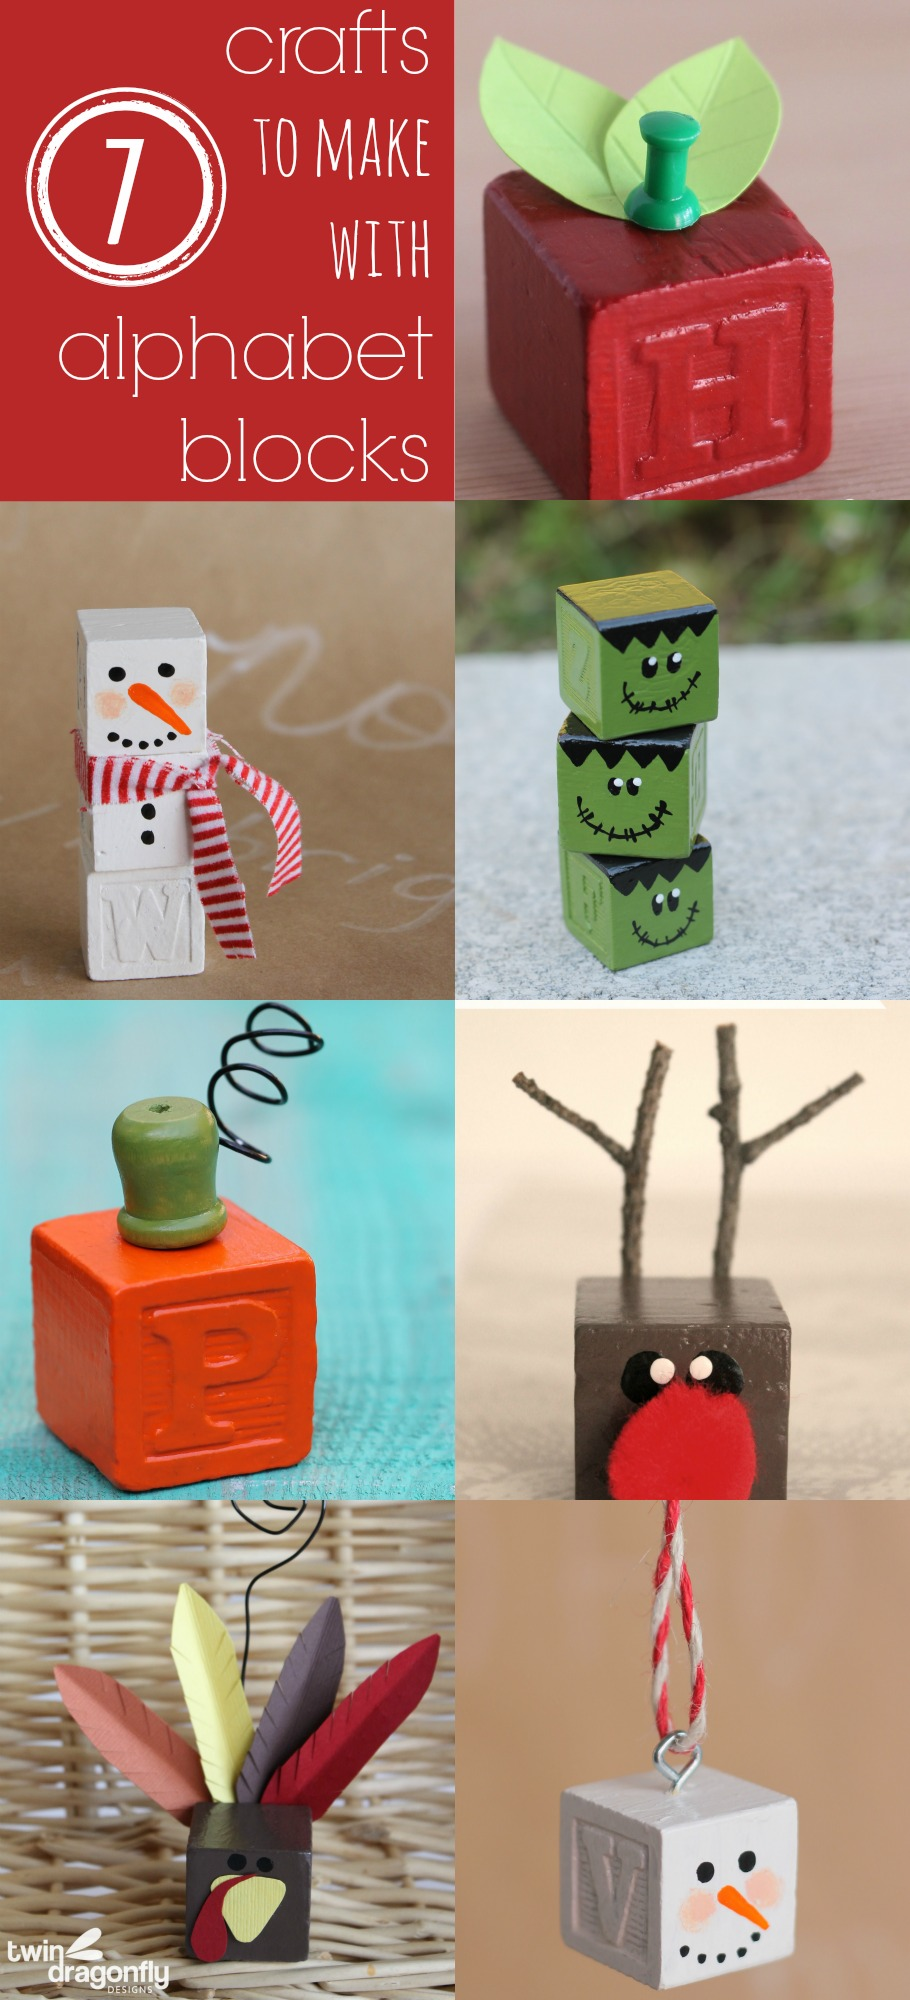 Seven Crafts to Make with Alphabet Blocks